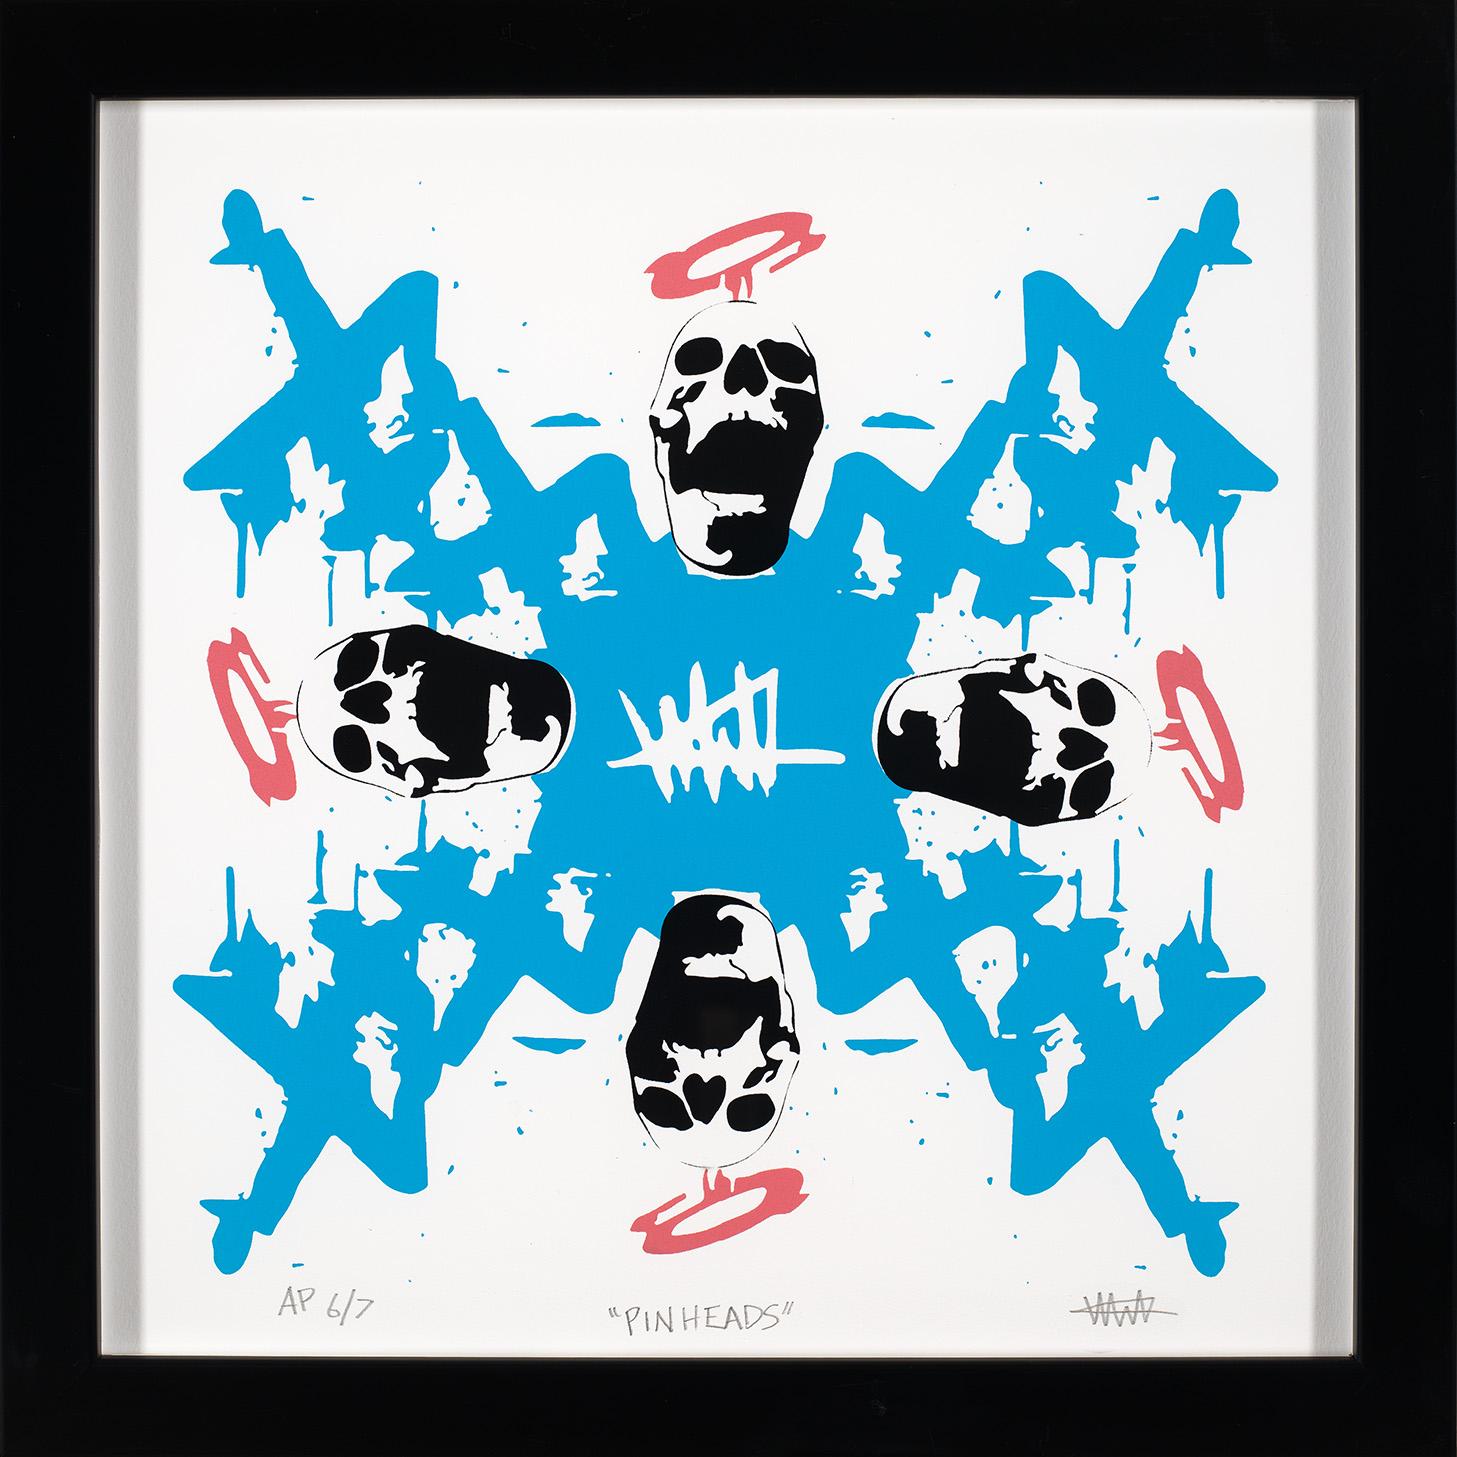 "Pinheads (AP 6/7)  3c screen print on cotton rag paper 15""x15"" (framed)  $250"